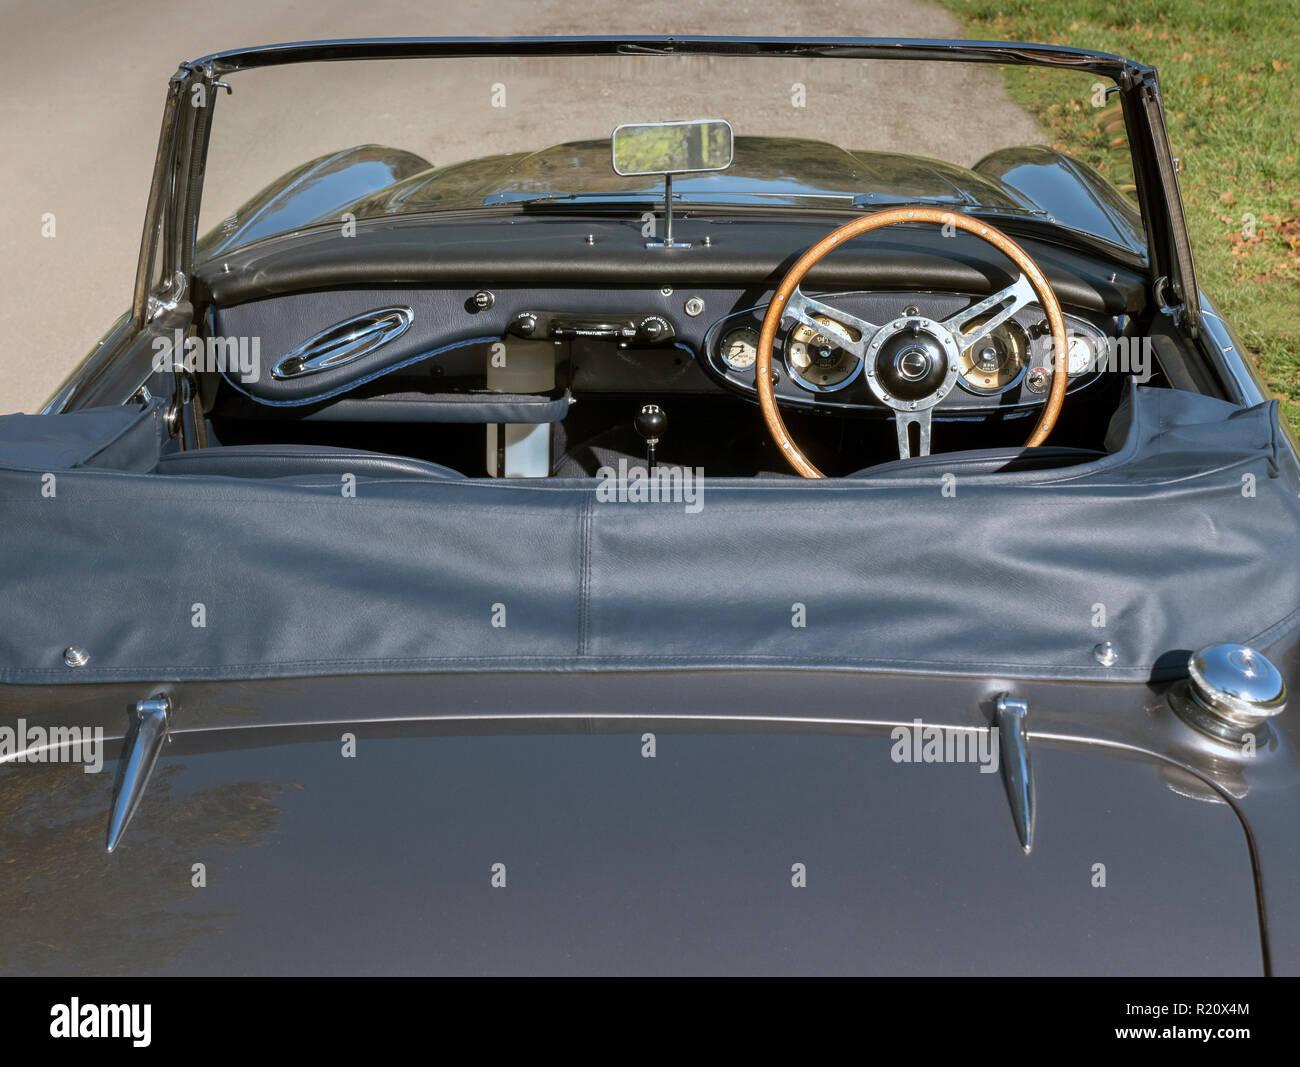 1964 Austin Healey BJ 7 Innenraum und Armaturenbrett Stockbild